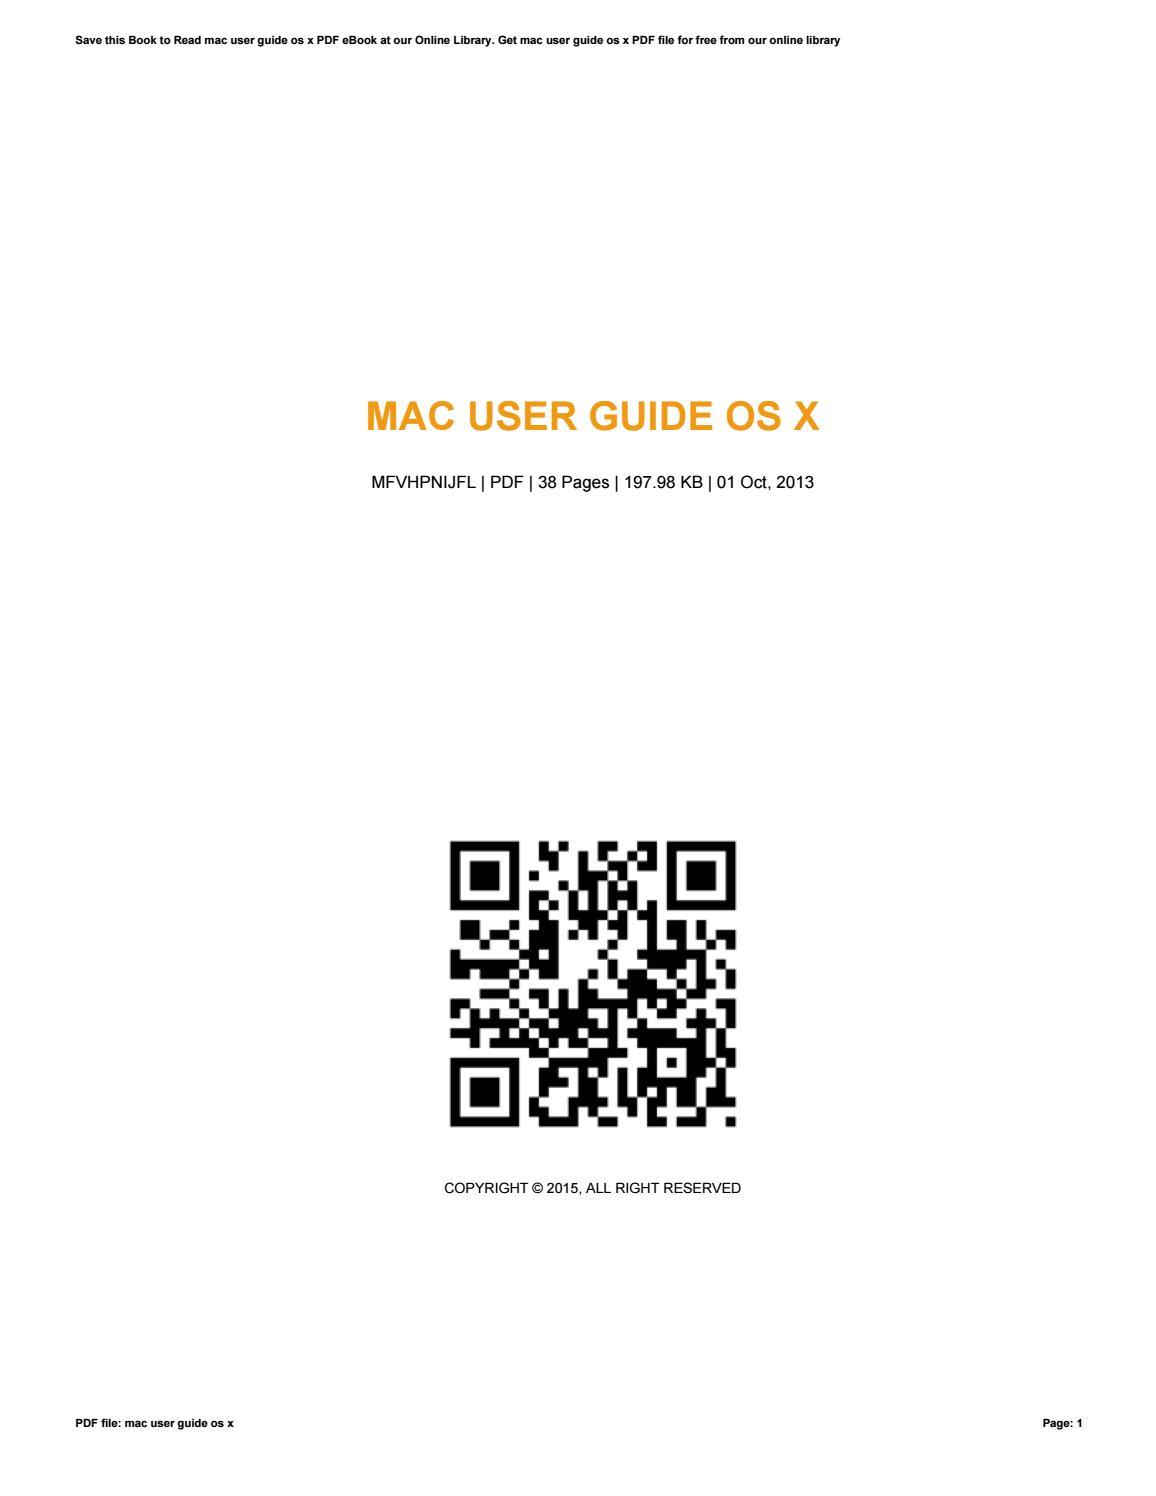 Bdm's macos user guides – 24 july 2018 free pdf magazine download.